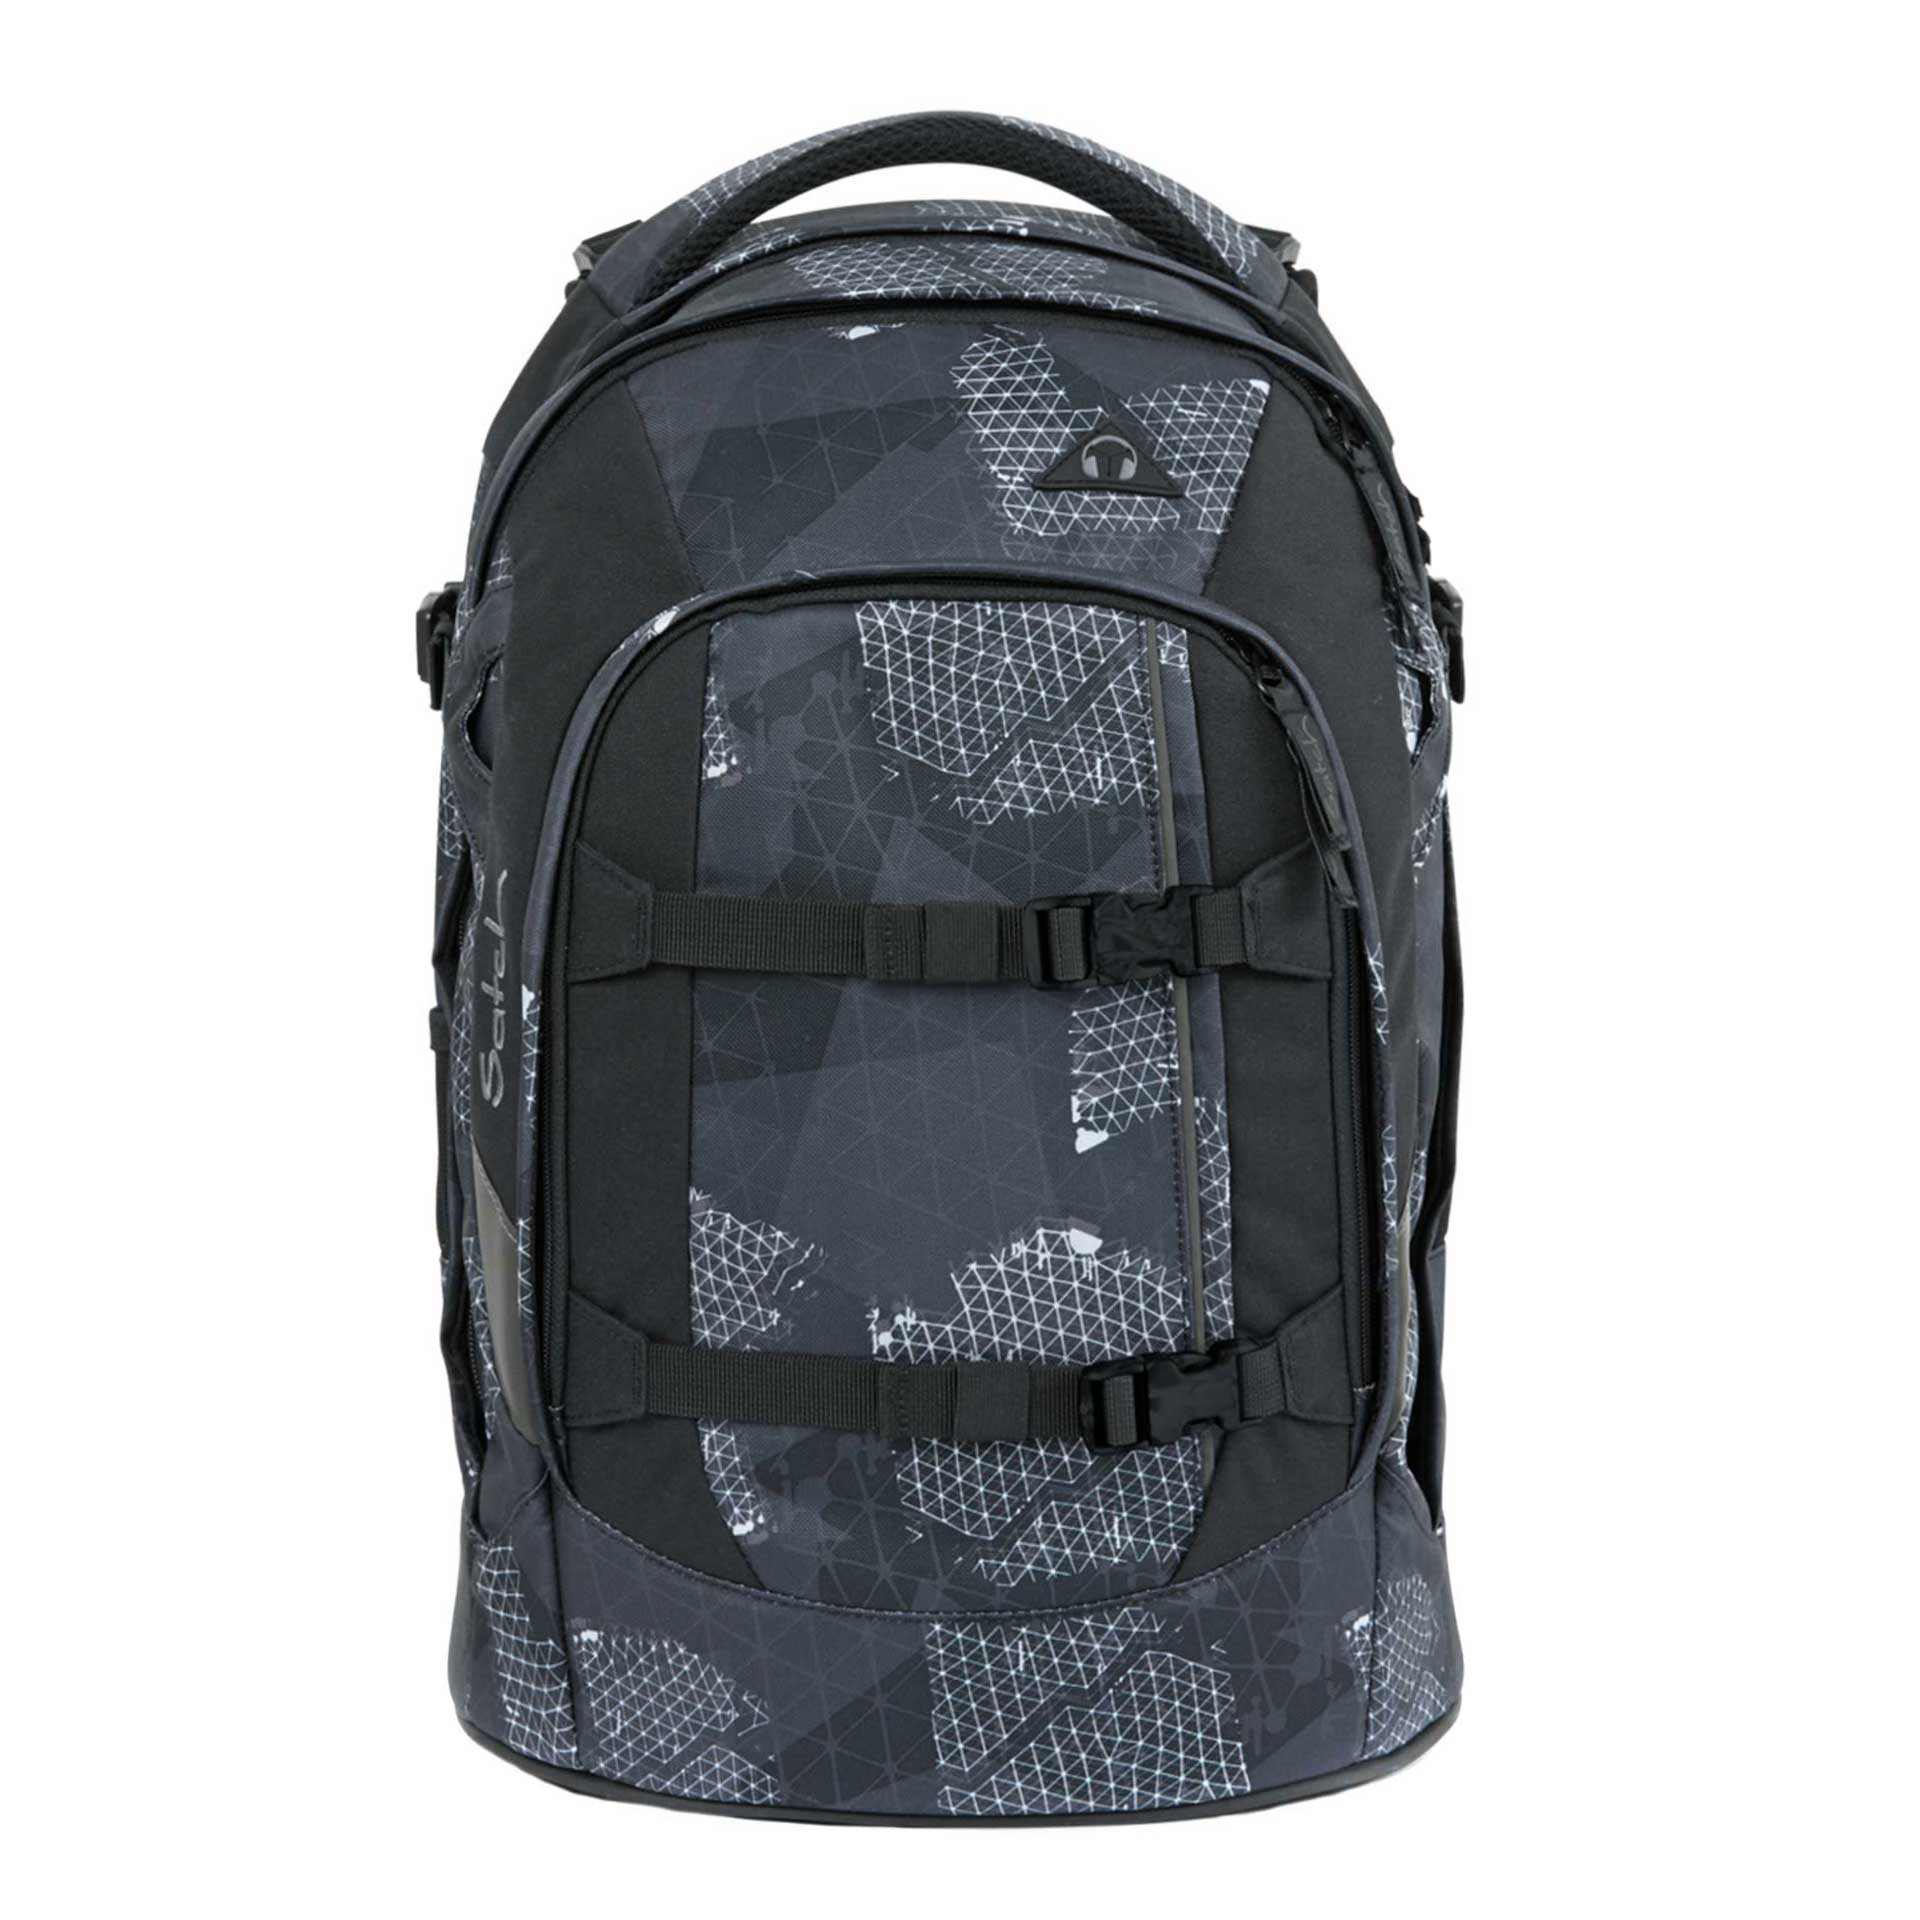 Satch pack Rucksack infra grey